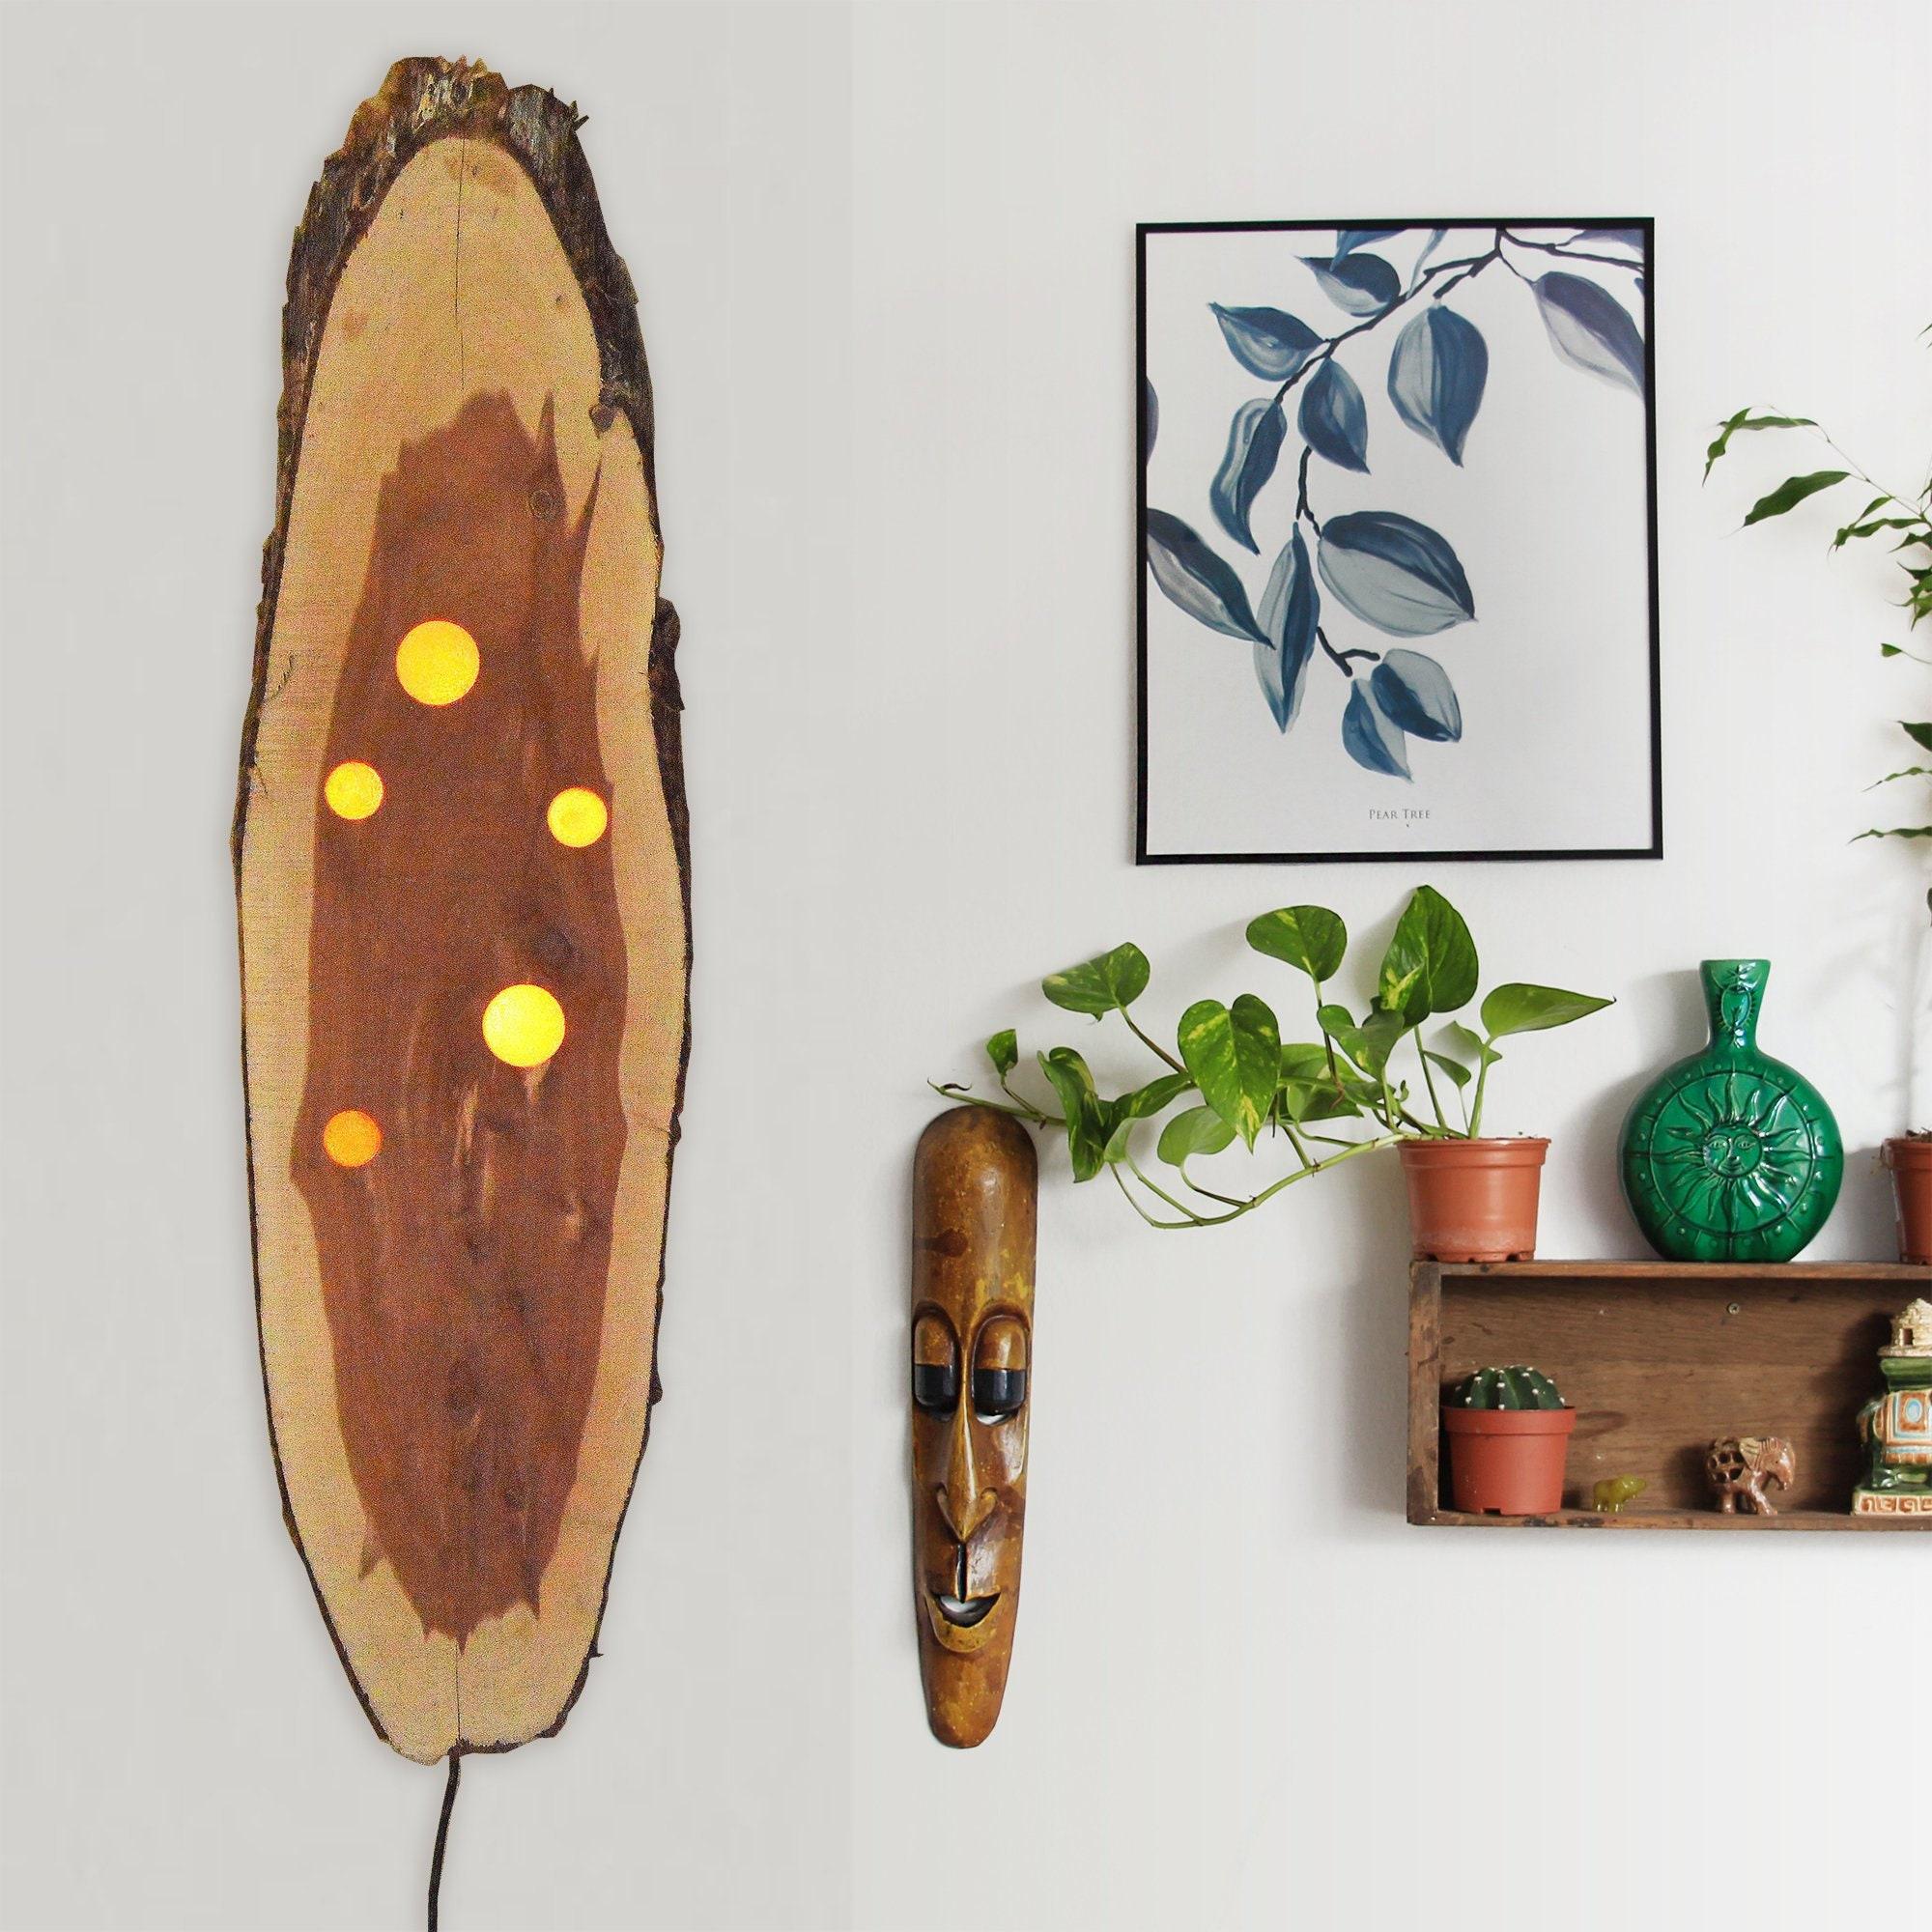 Wall Sconce Rustic Wall Decor Wood Light Wall Lighting Etsy